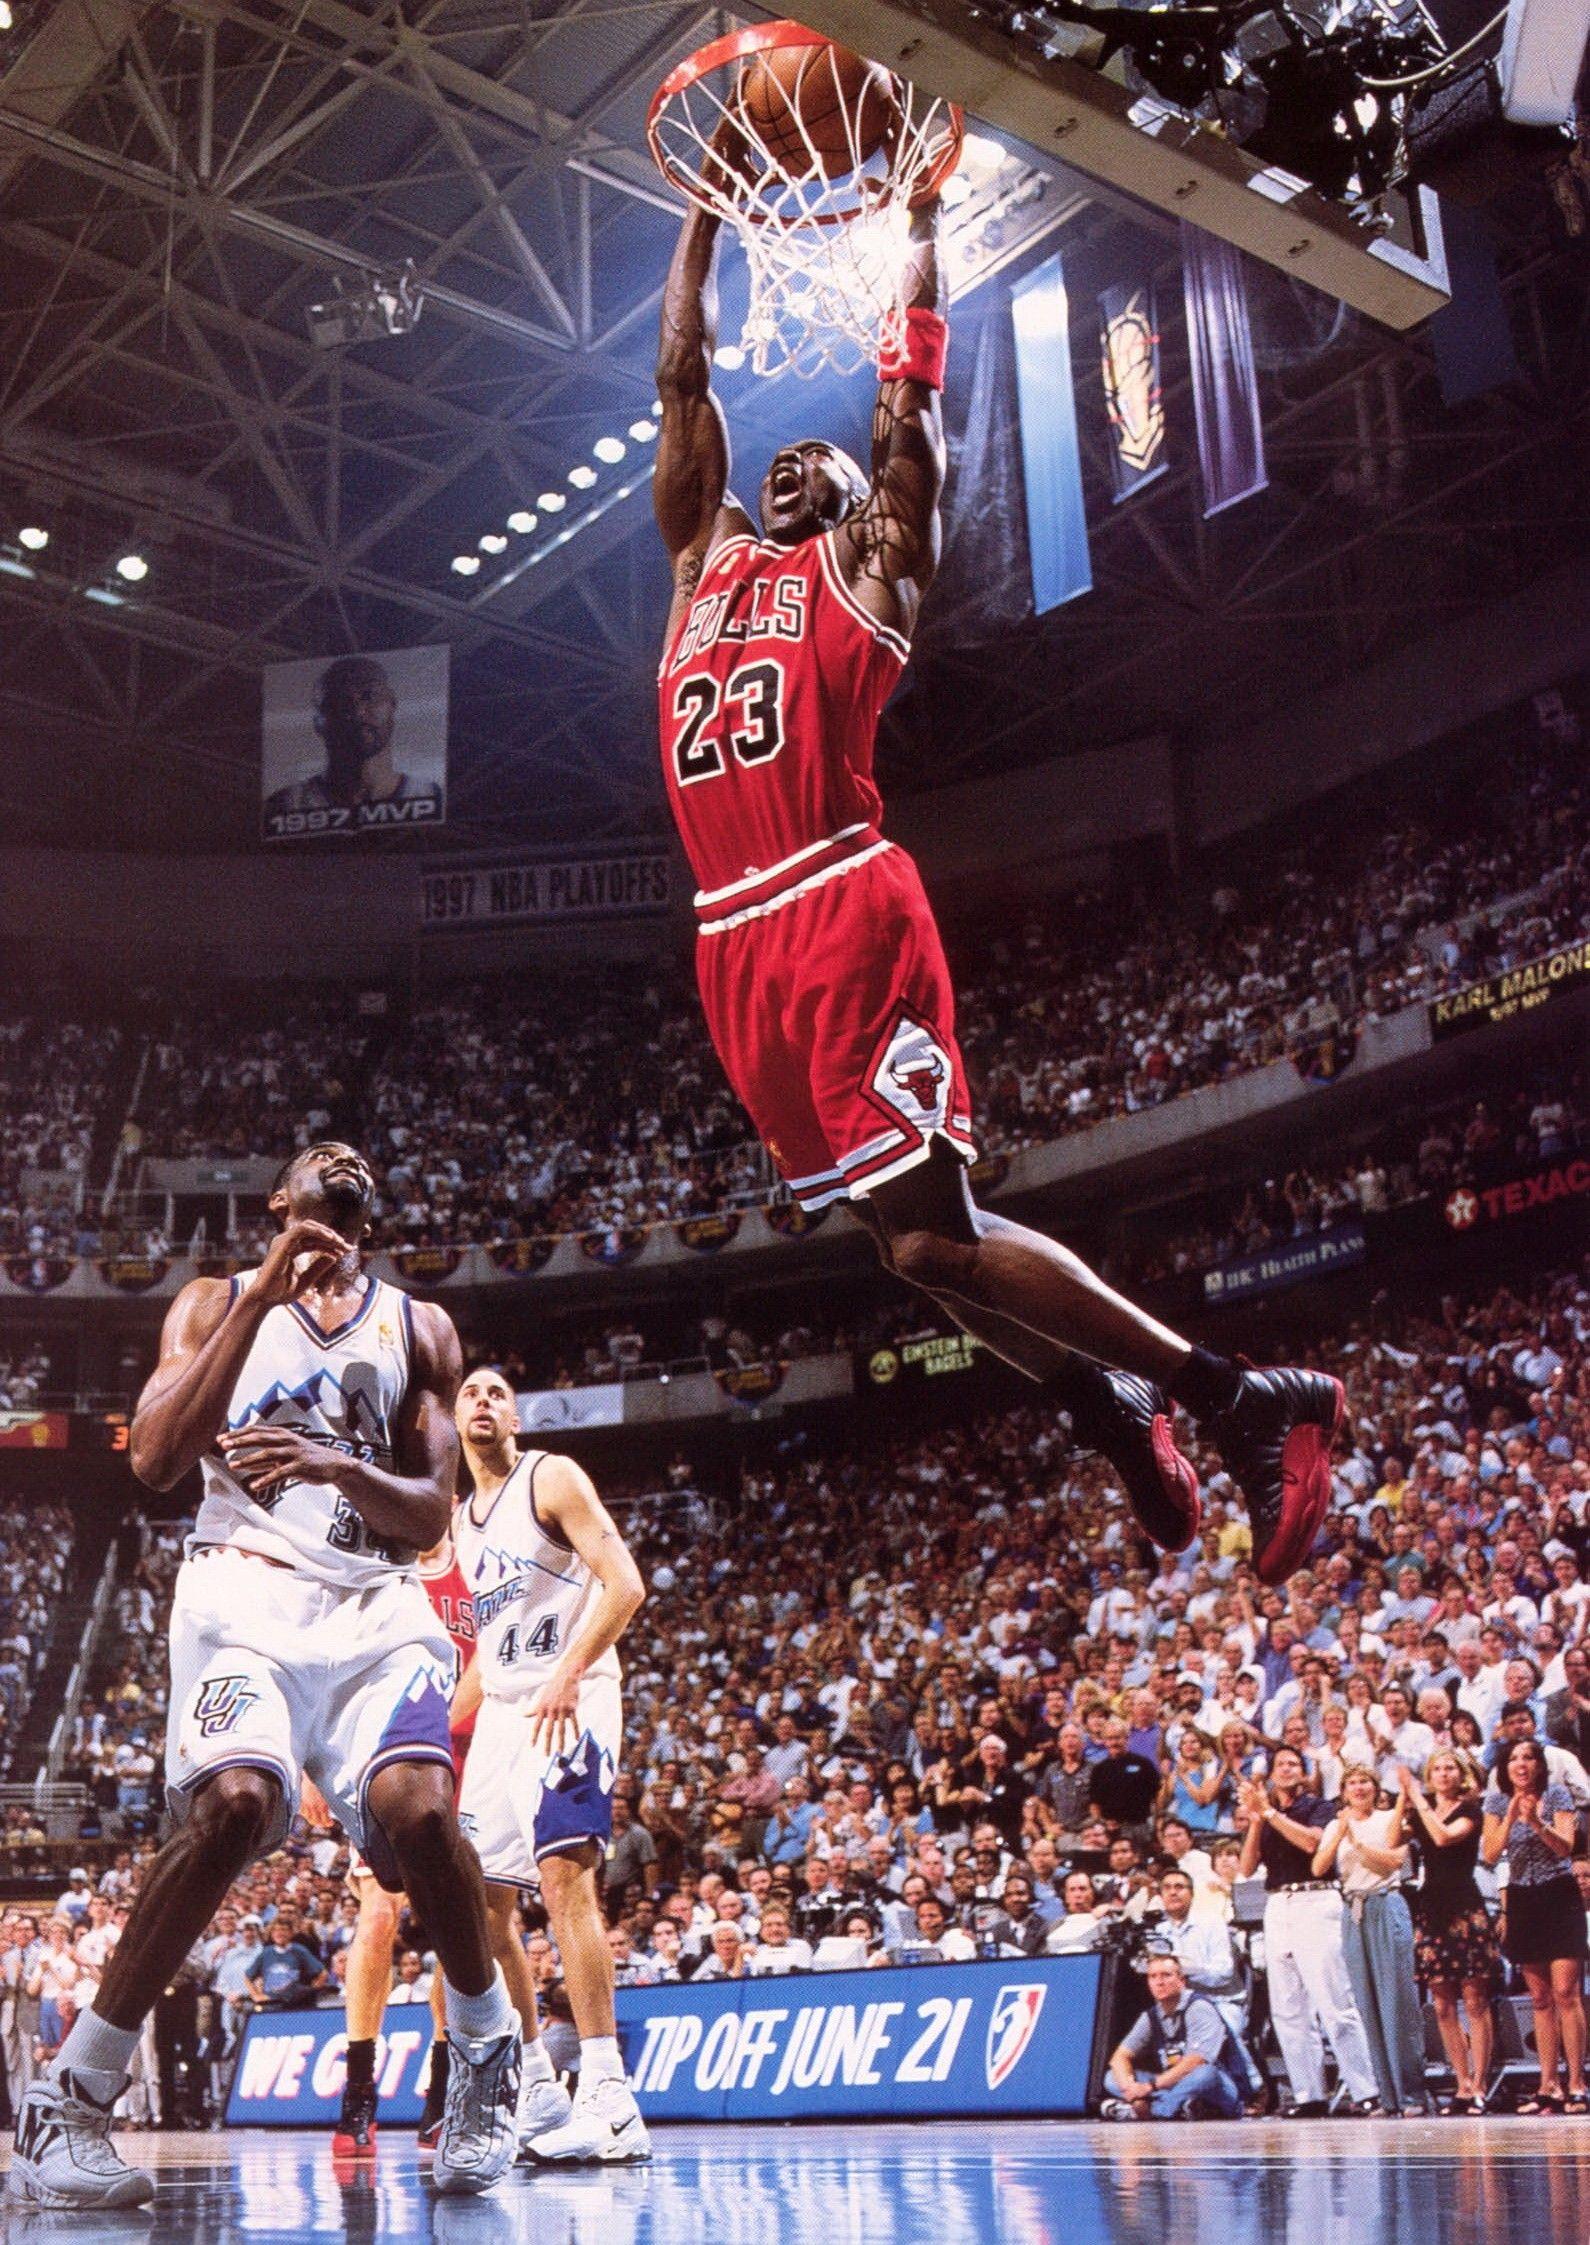 Michael Jordan Wallpaper 4k 1590x2245 Wallpaper Teahub Io